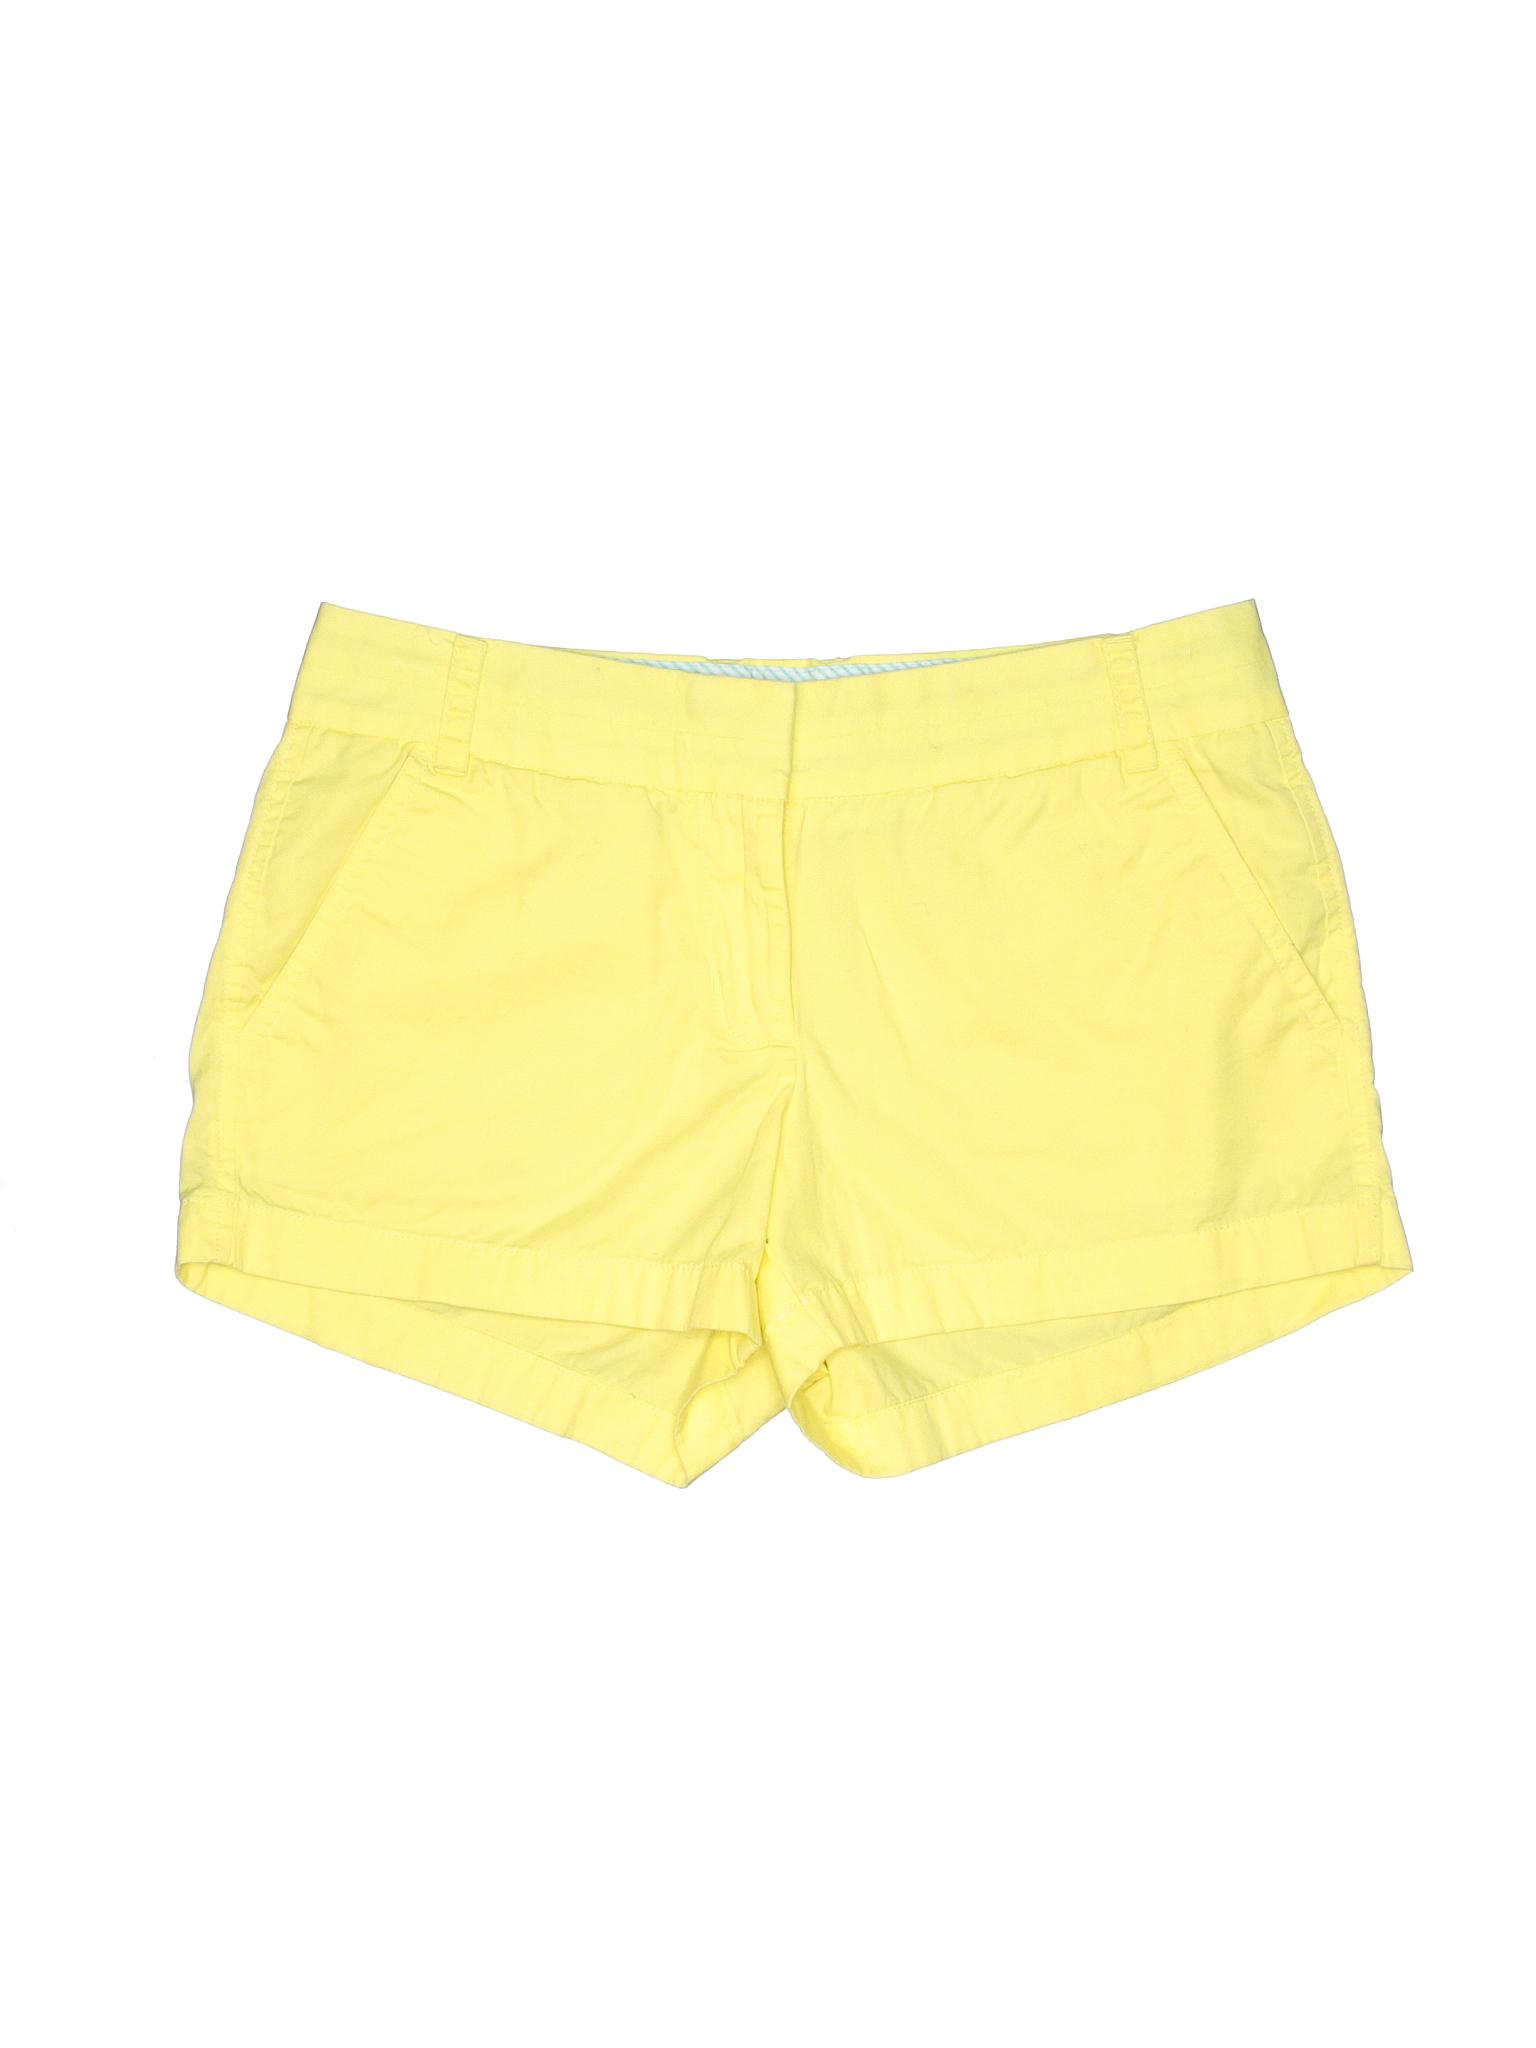 Factory Crew J Store Shorts Boutique TwHE5g